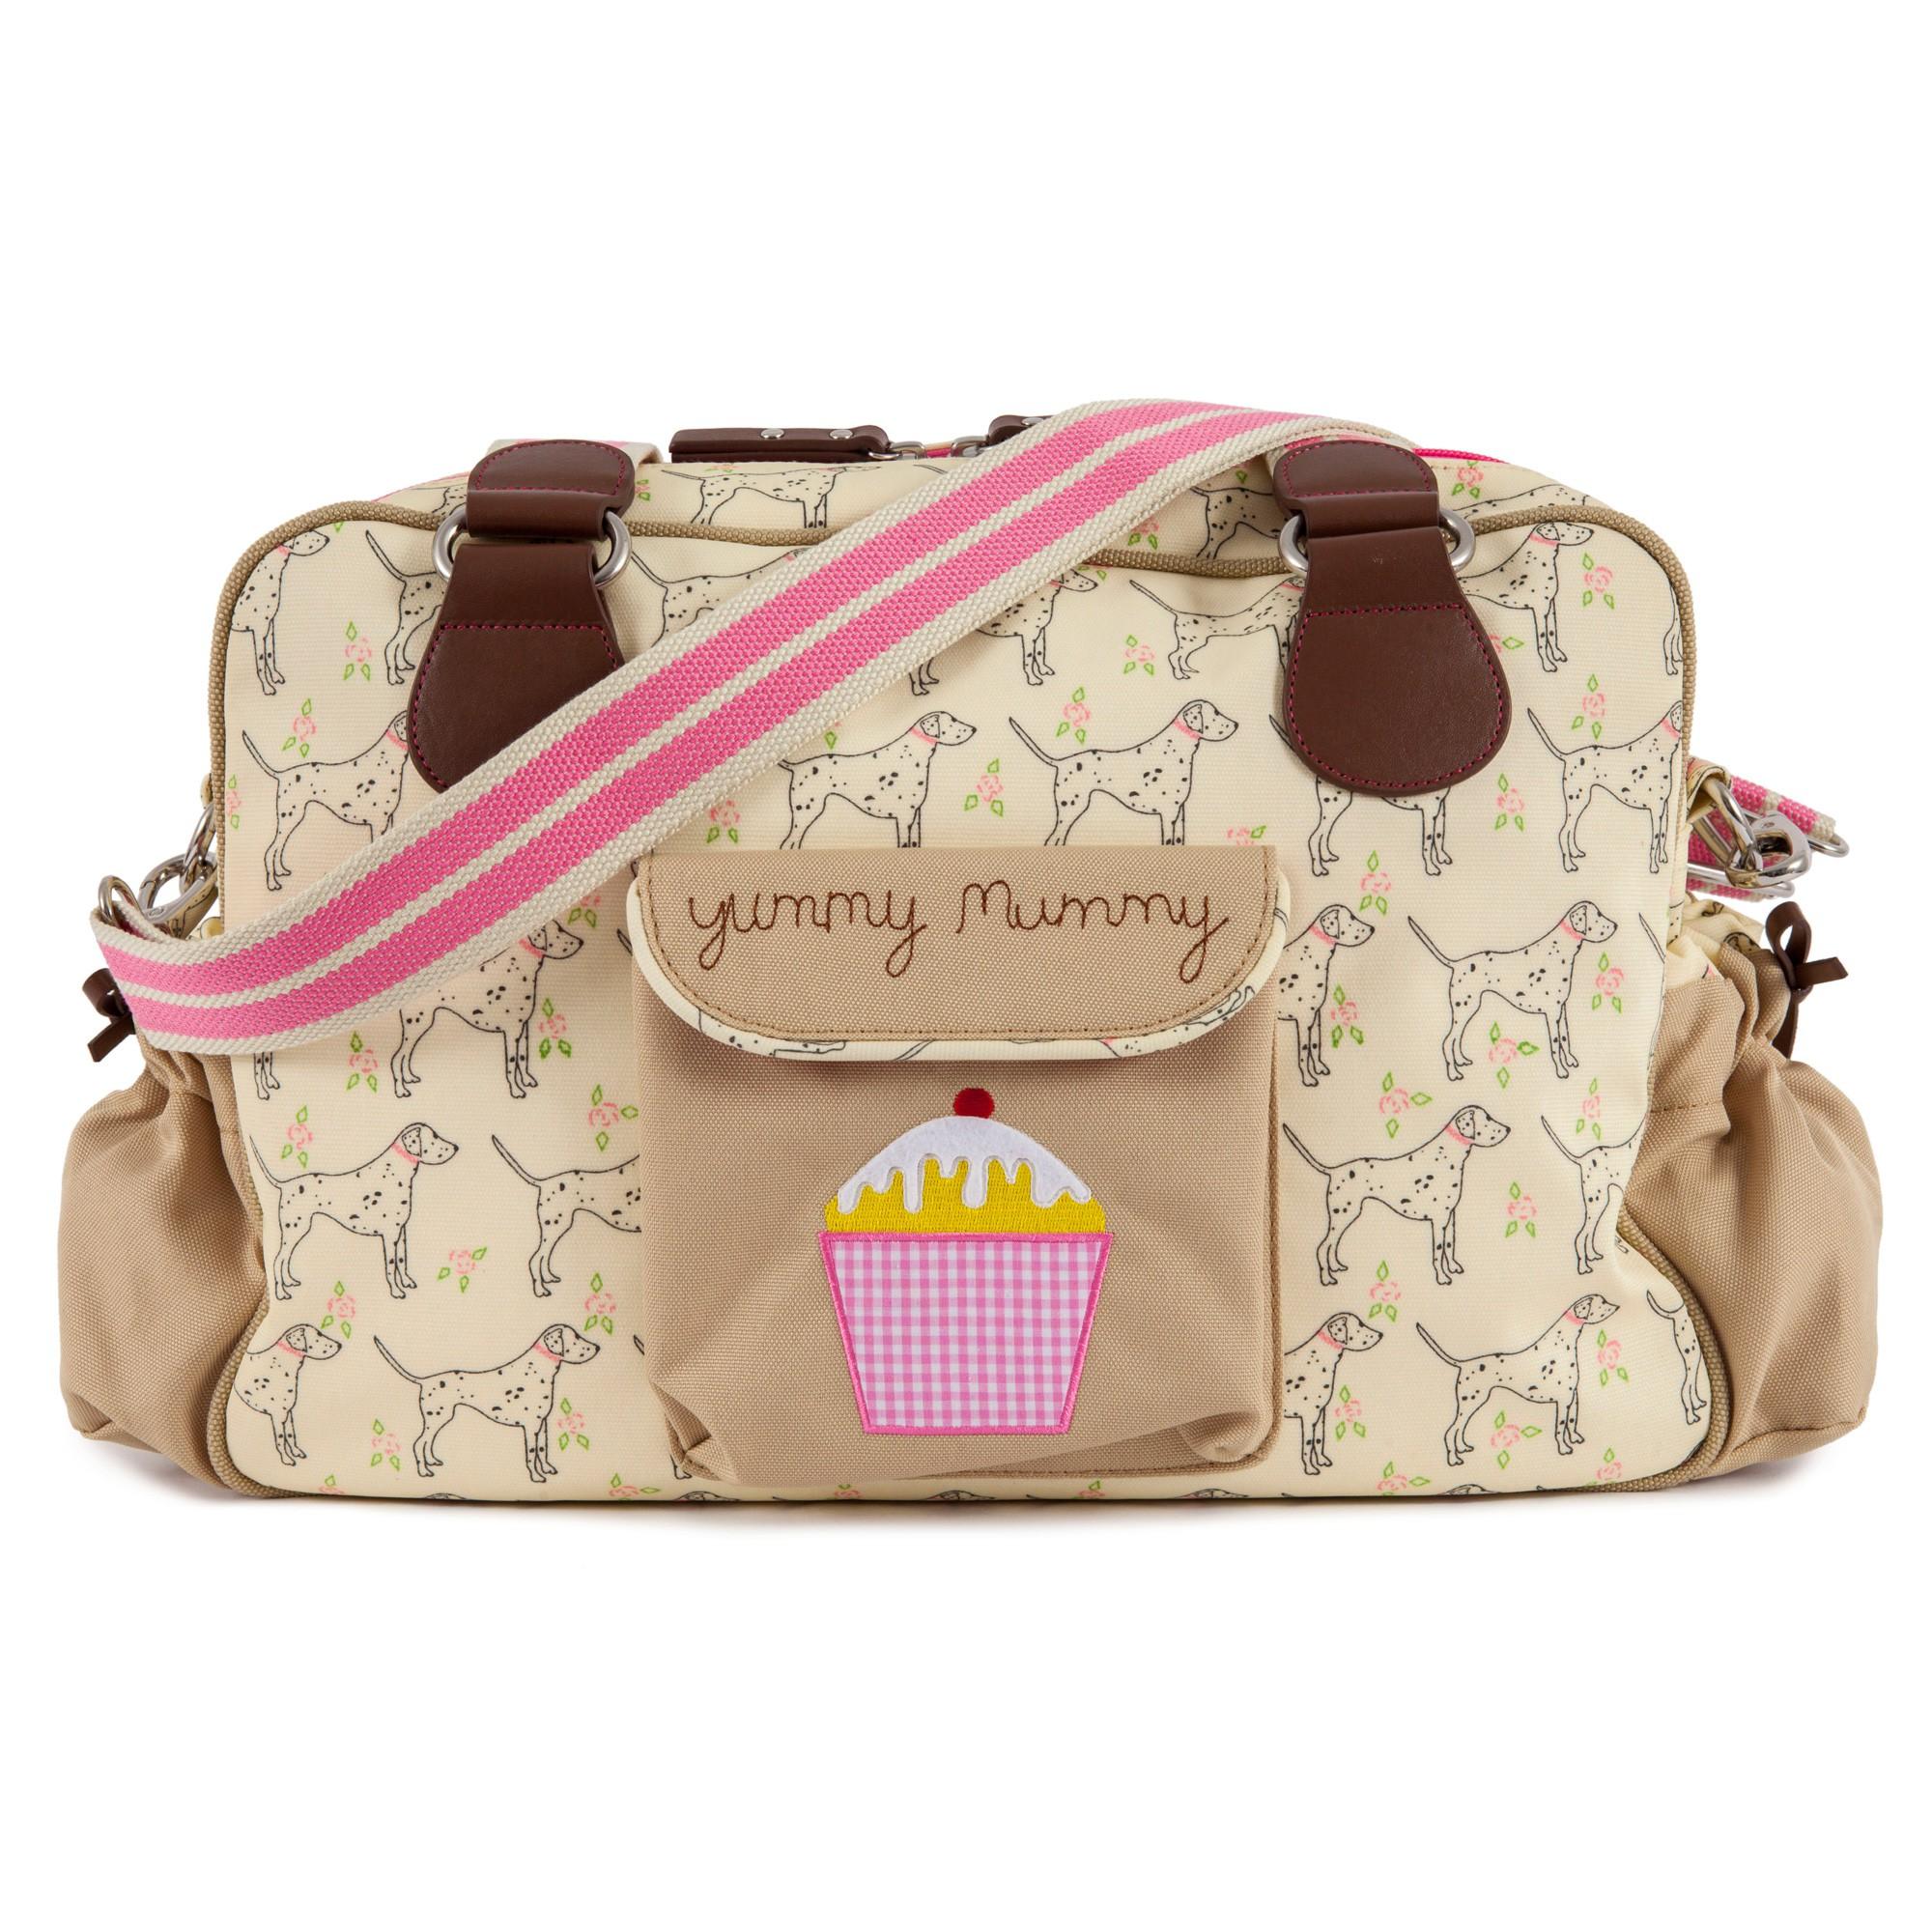 yummy mummy dalmatian pink lining wickeltasche yummy mummy. Black Bedroom Furniture Sets. Home Design Ideas